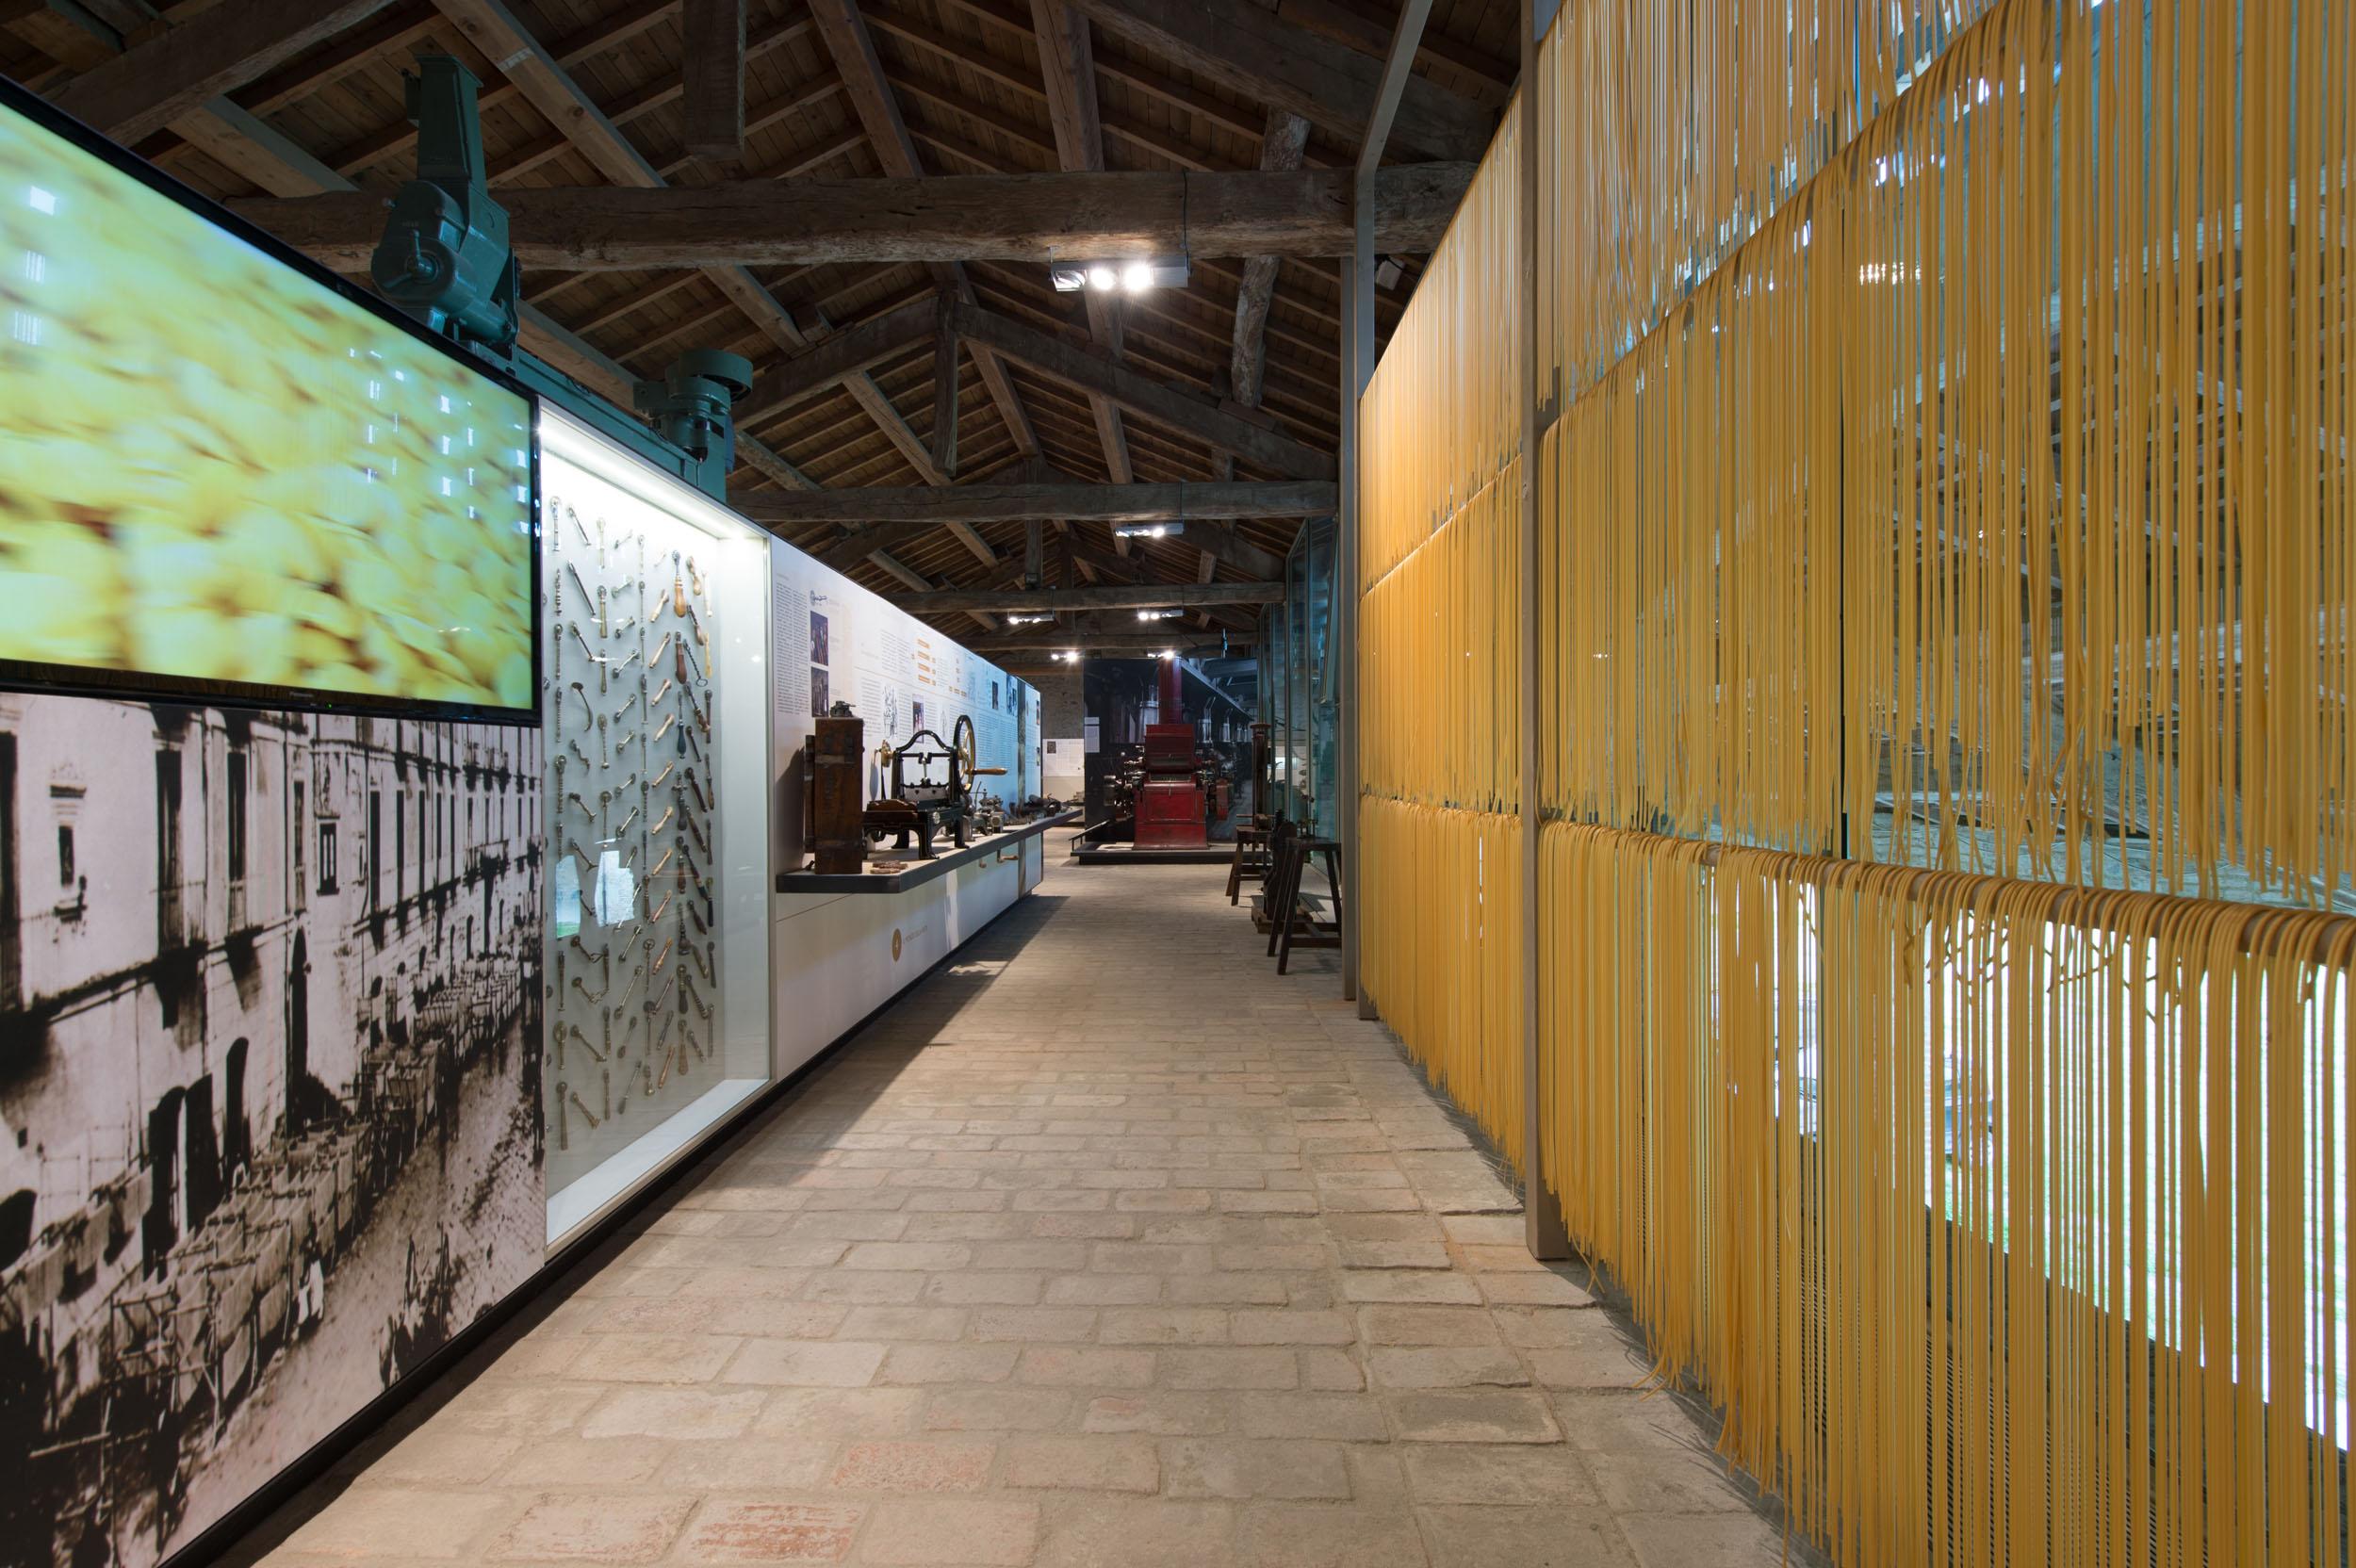 Pasta Museum in Collecchio (PR), interior n. 2 (Picture by L. Rossi)